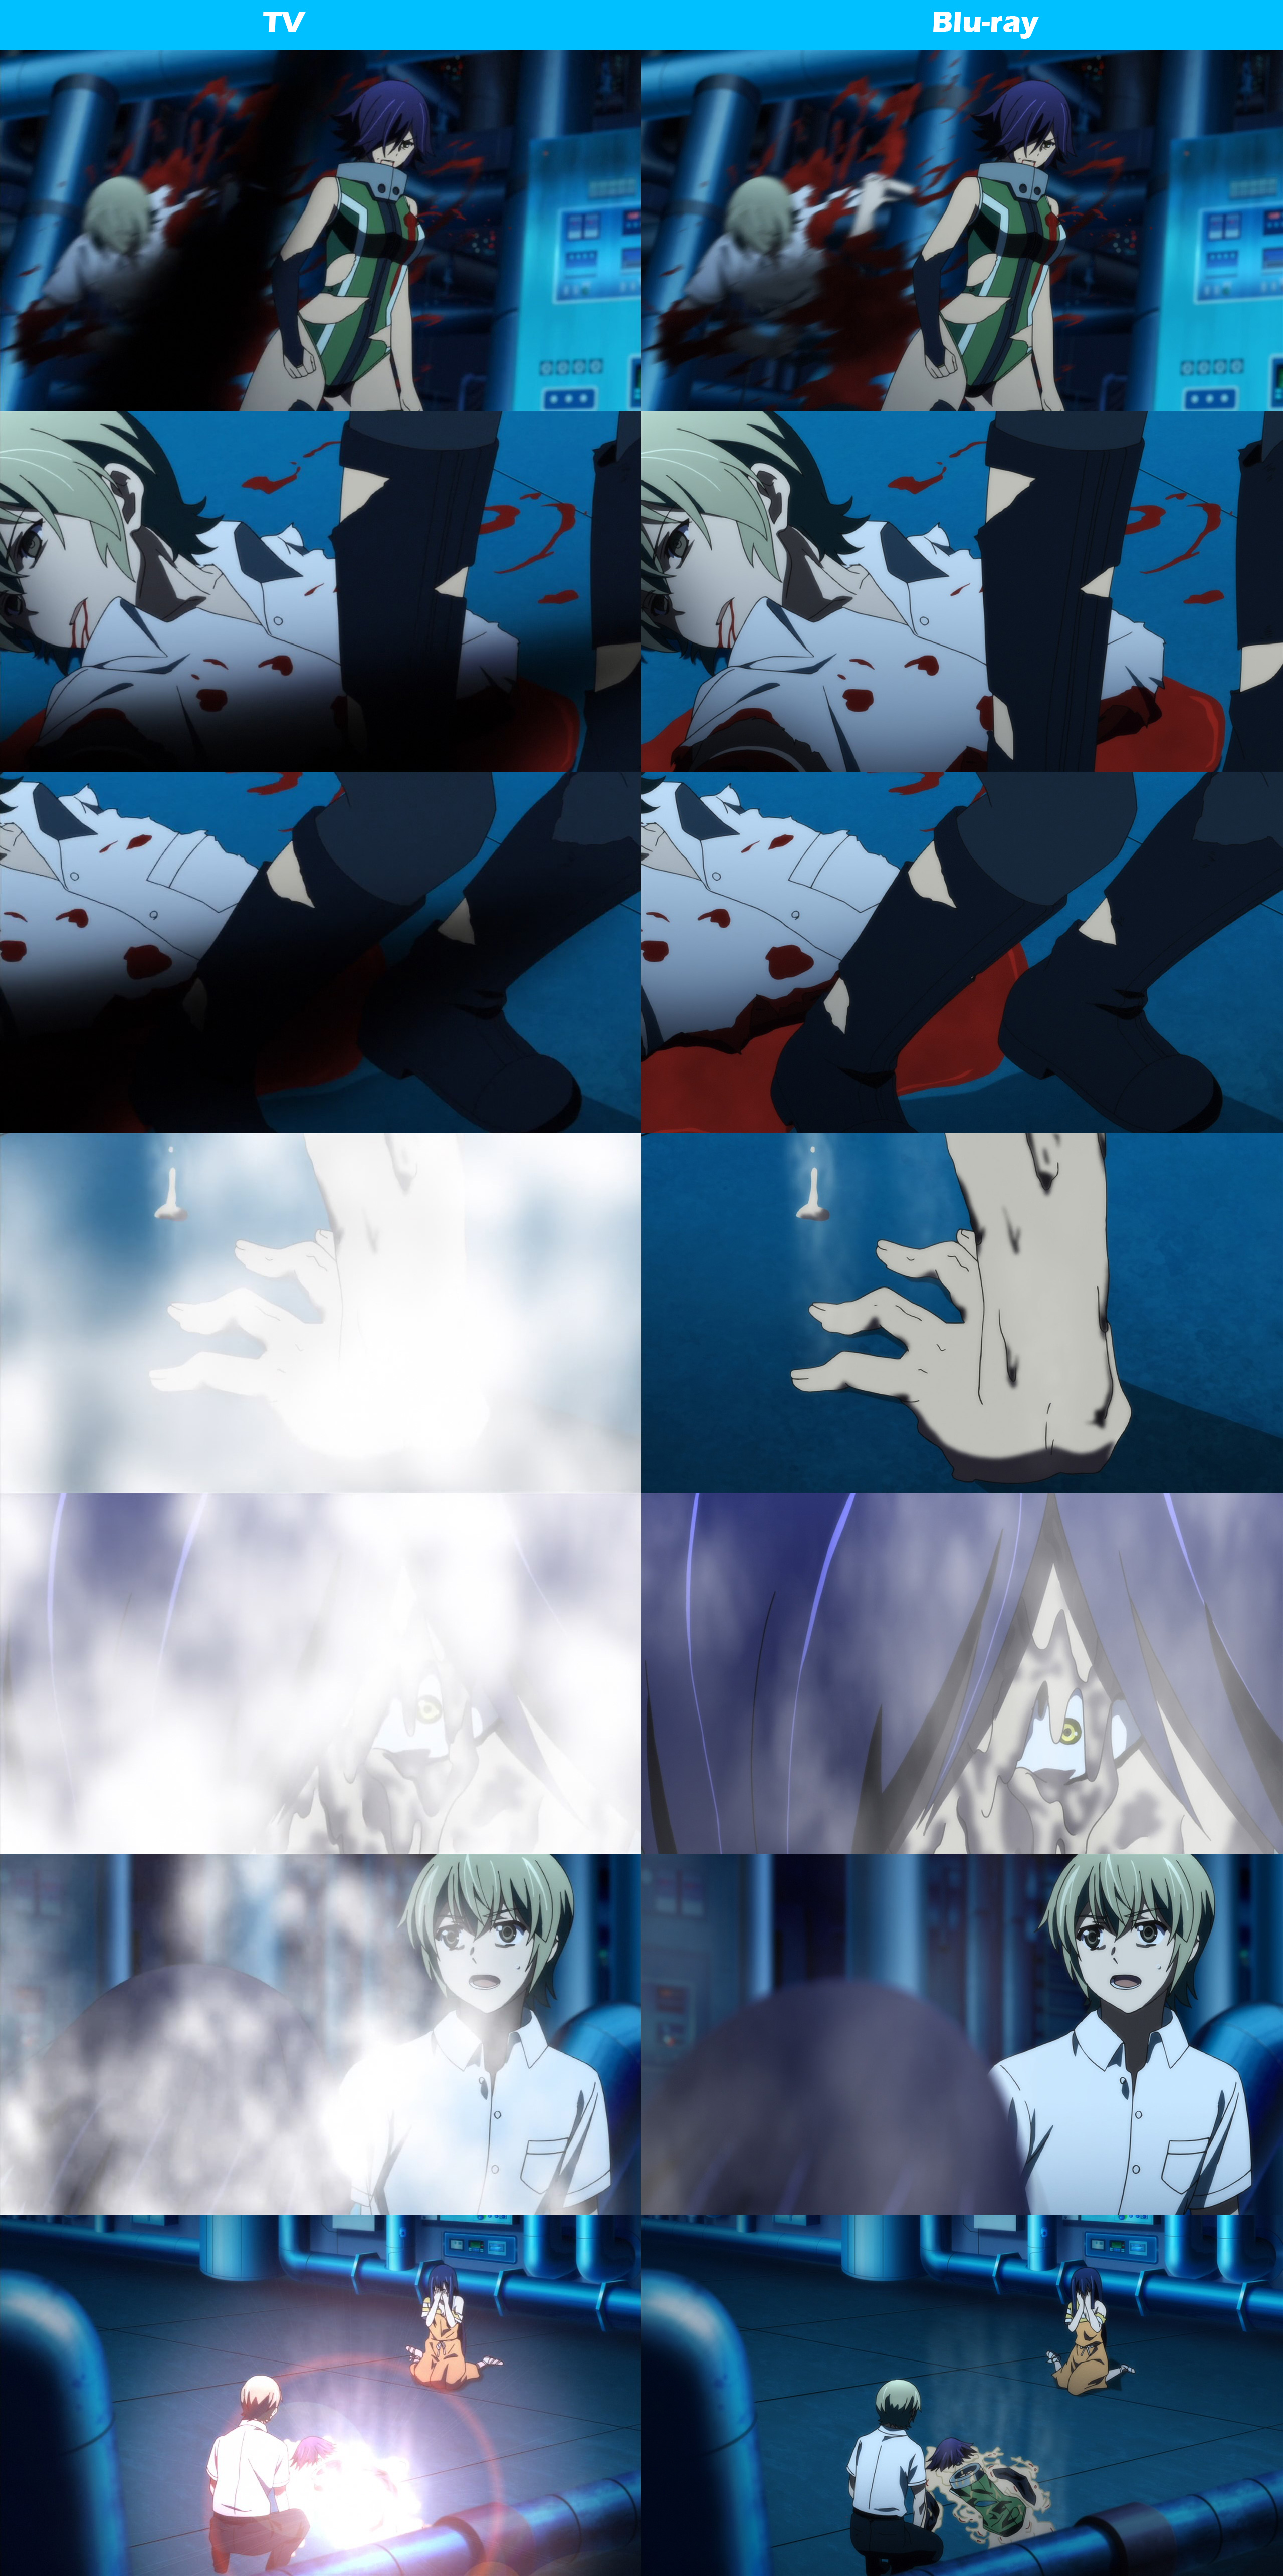 Gokukoku-no-Brynhildr-TV-and-Blu-ray-Comparisons-Gore-2_Haruhichan.com